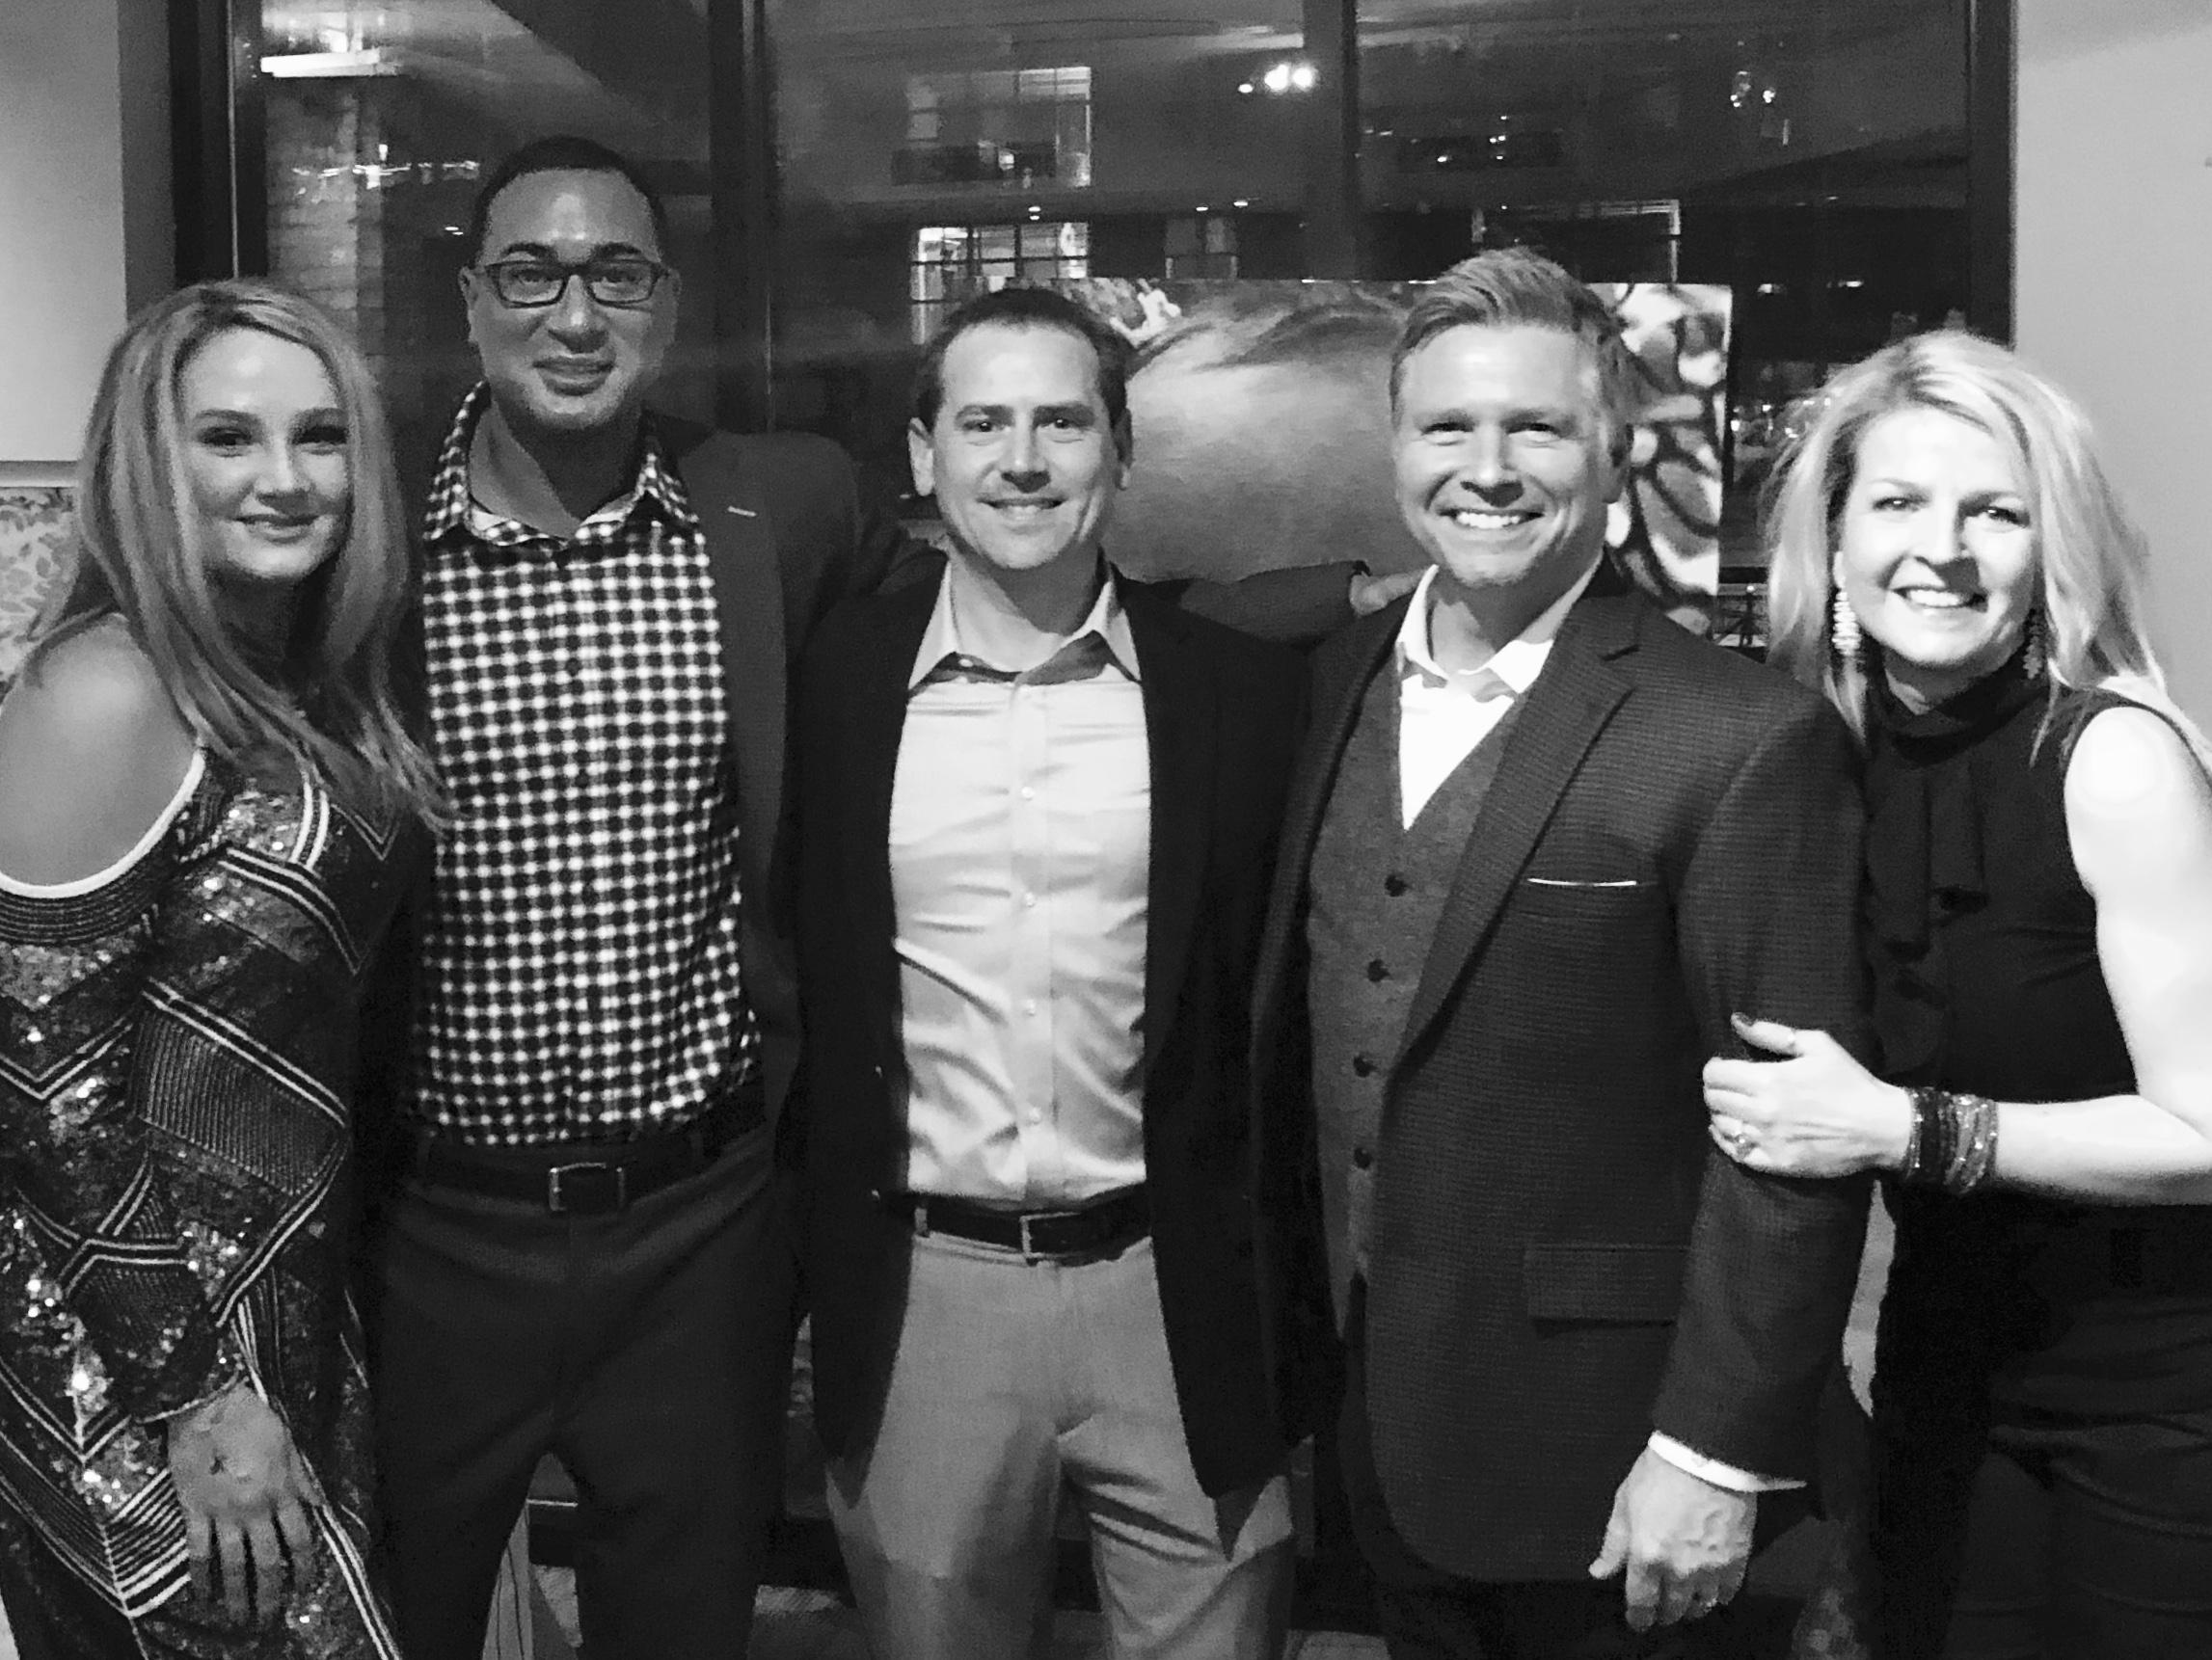 (L to R) Connie Shaikh (Paxton Andrews Foundation Board), Omar Shaikh (SURG Restaurant Group), Vince Vitrano (Today's TMJ4), with Craig Husar & Danielle Husar